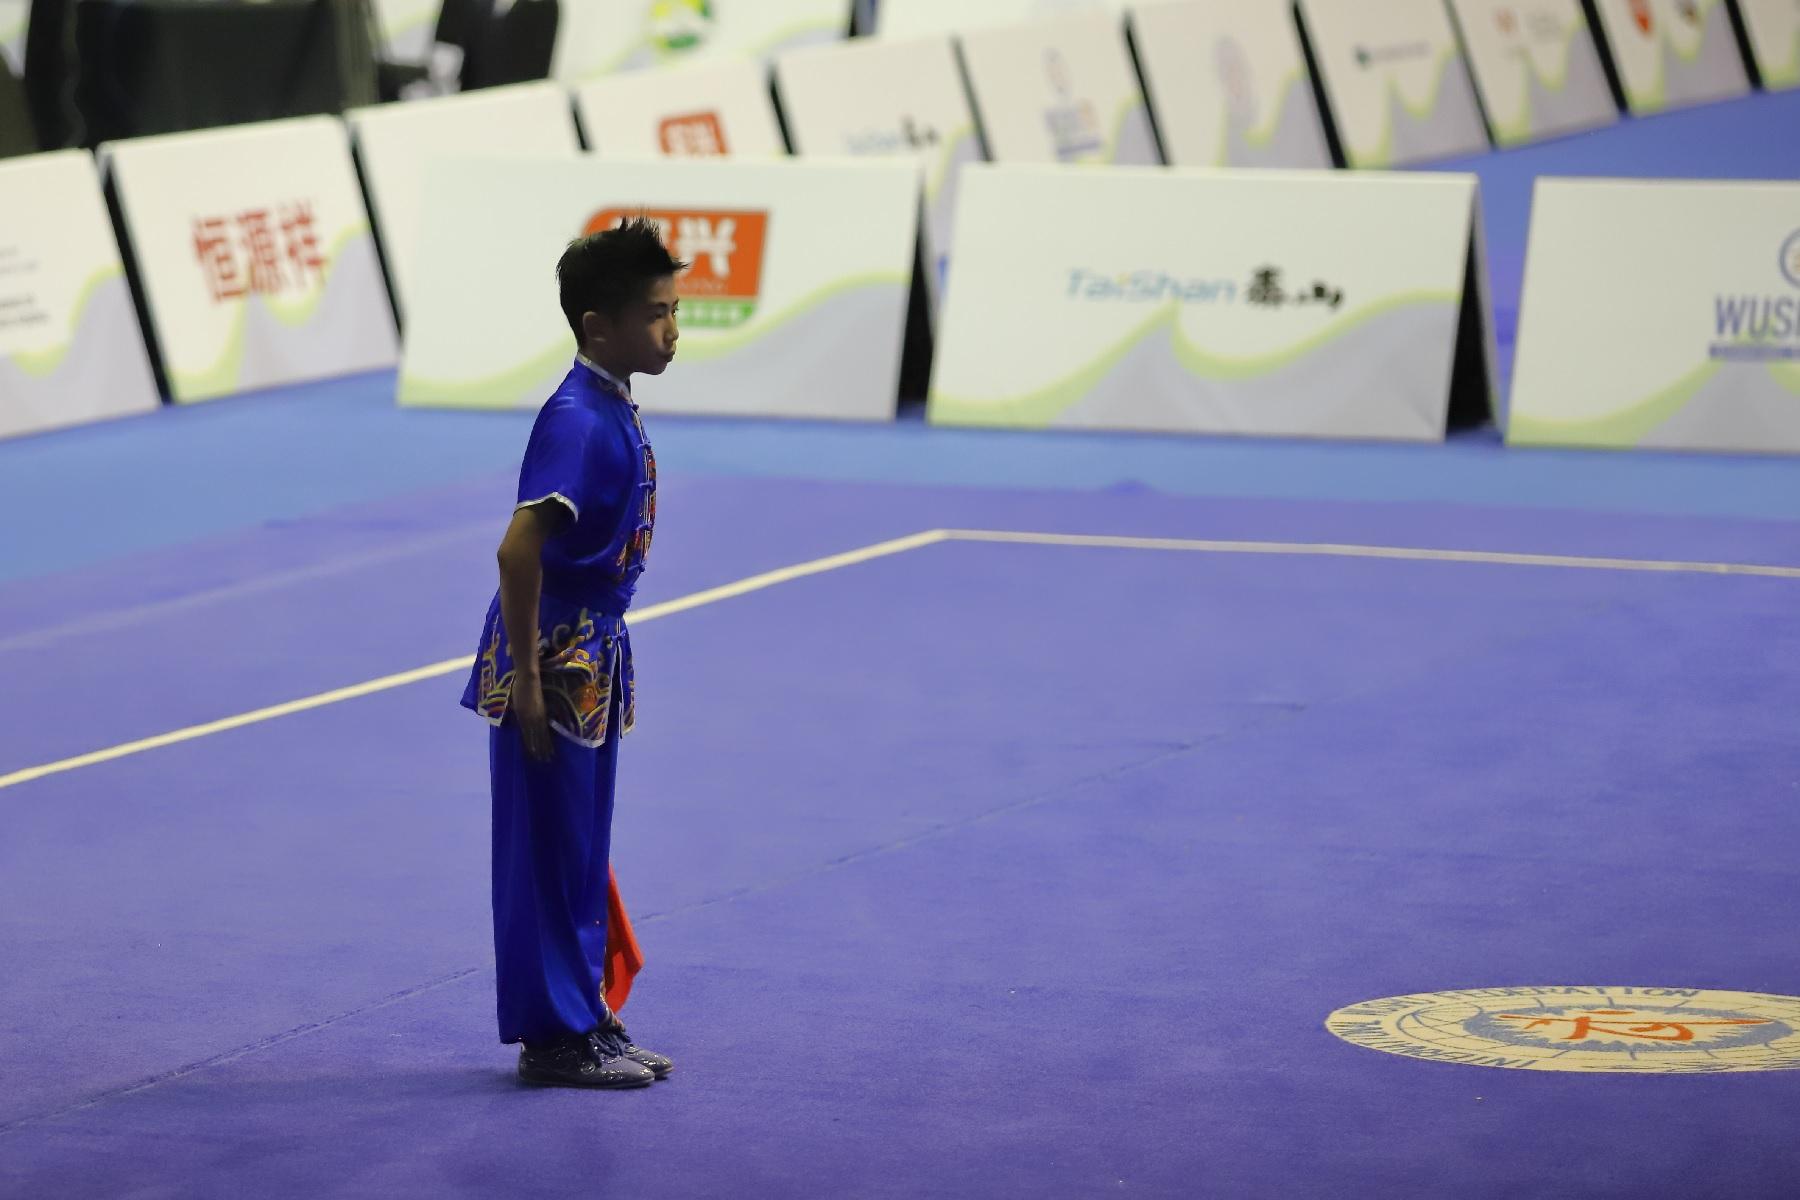 wayland-li-wushu-brazil-world-junior-wushu-championships-2018-team-canada-03.jpg